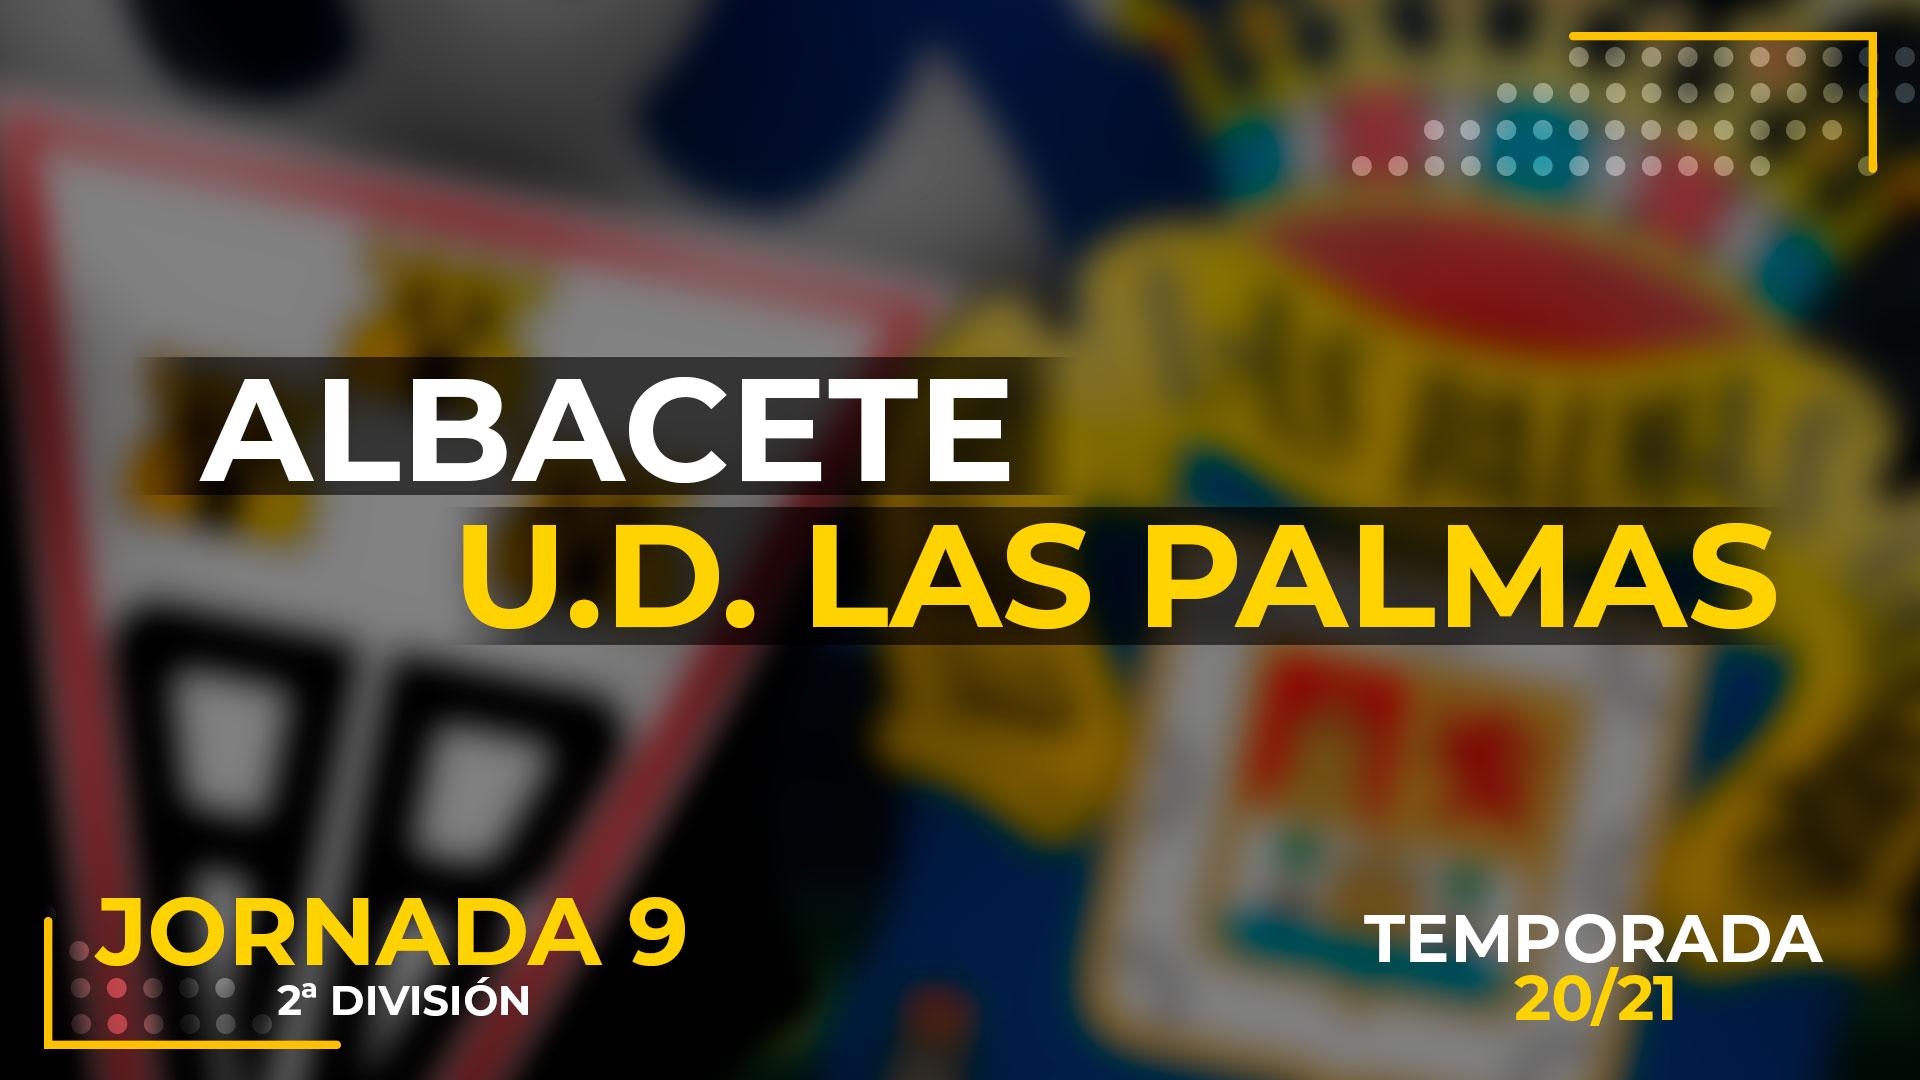 Albacete vs UD Las Palmas